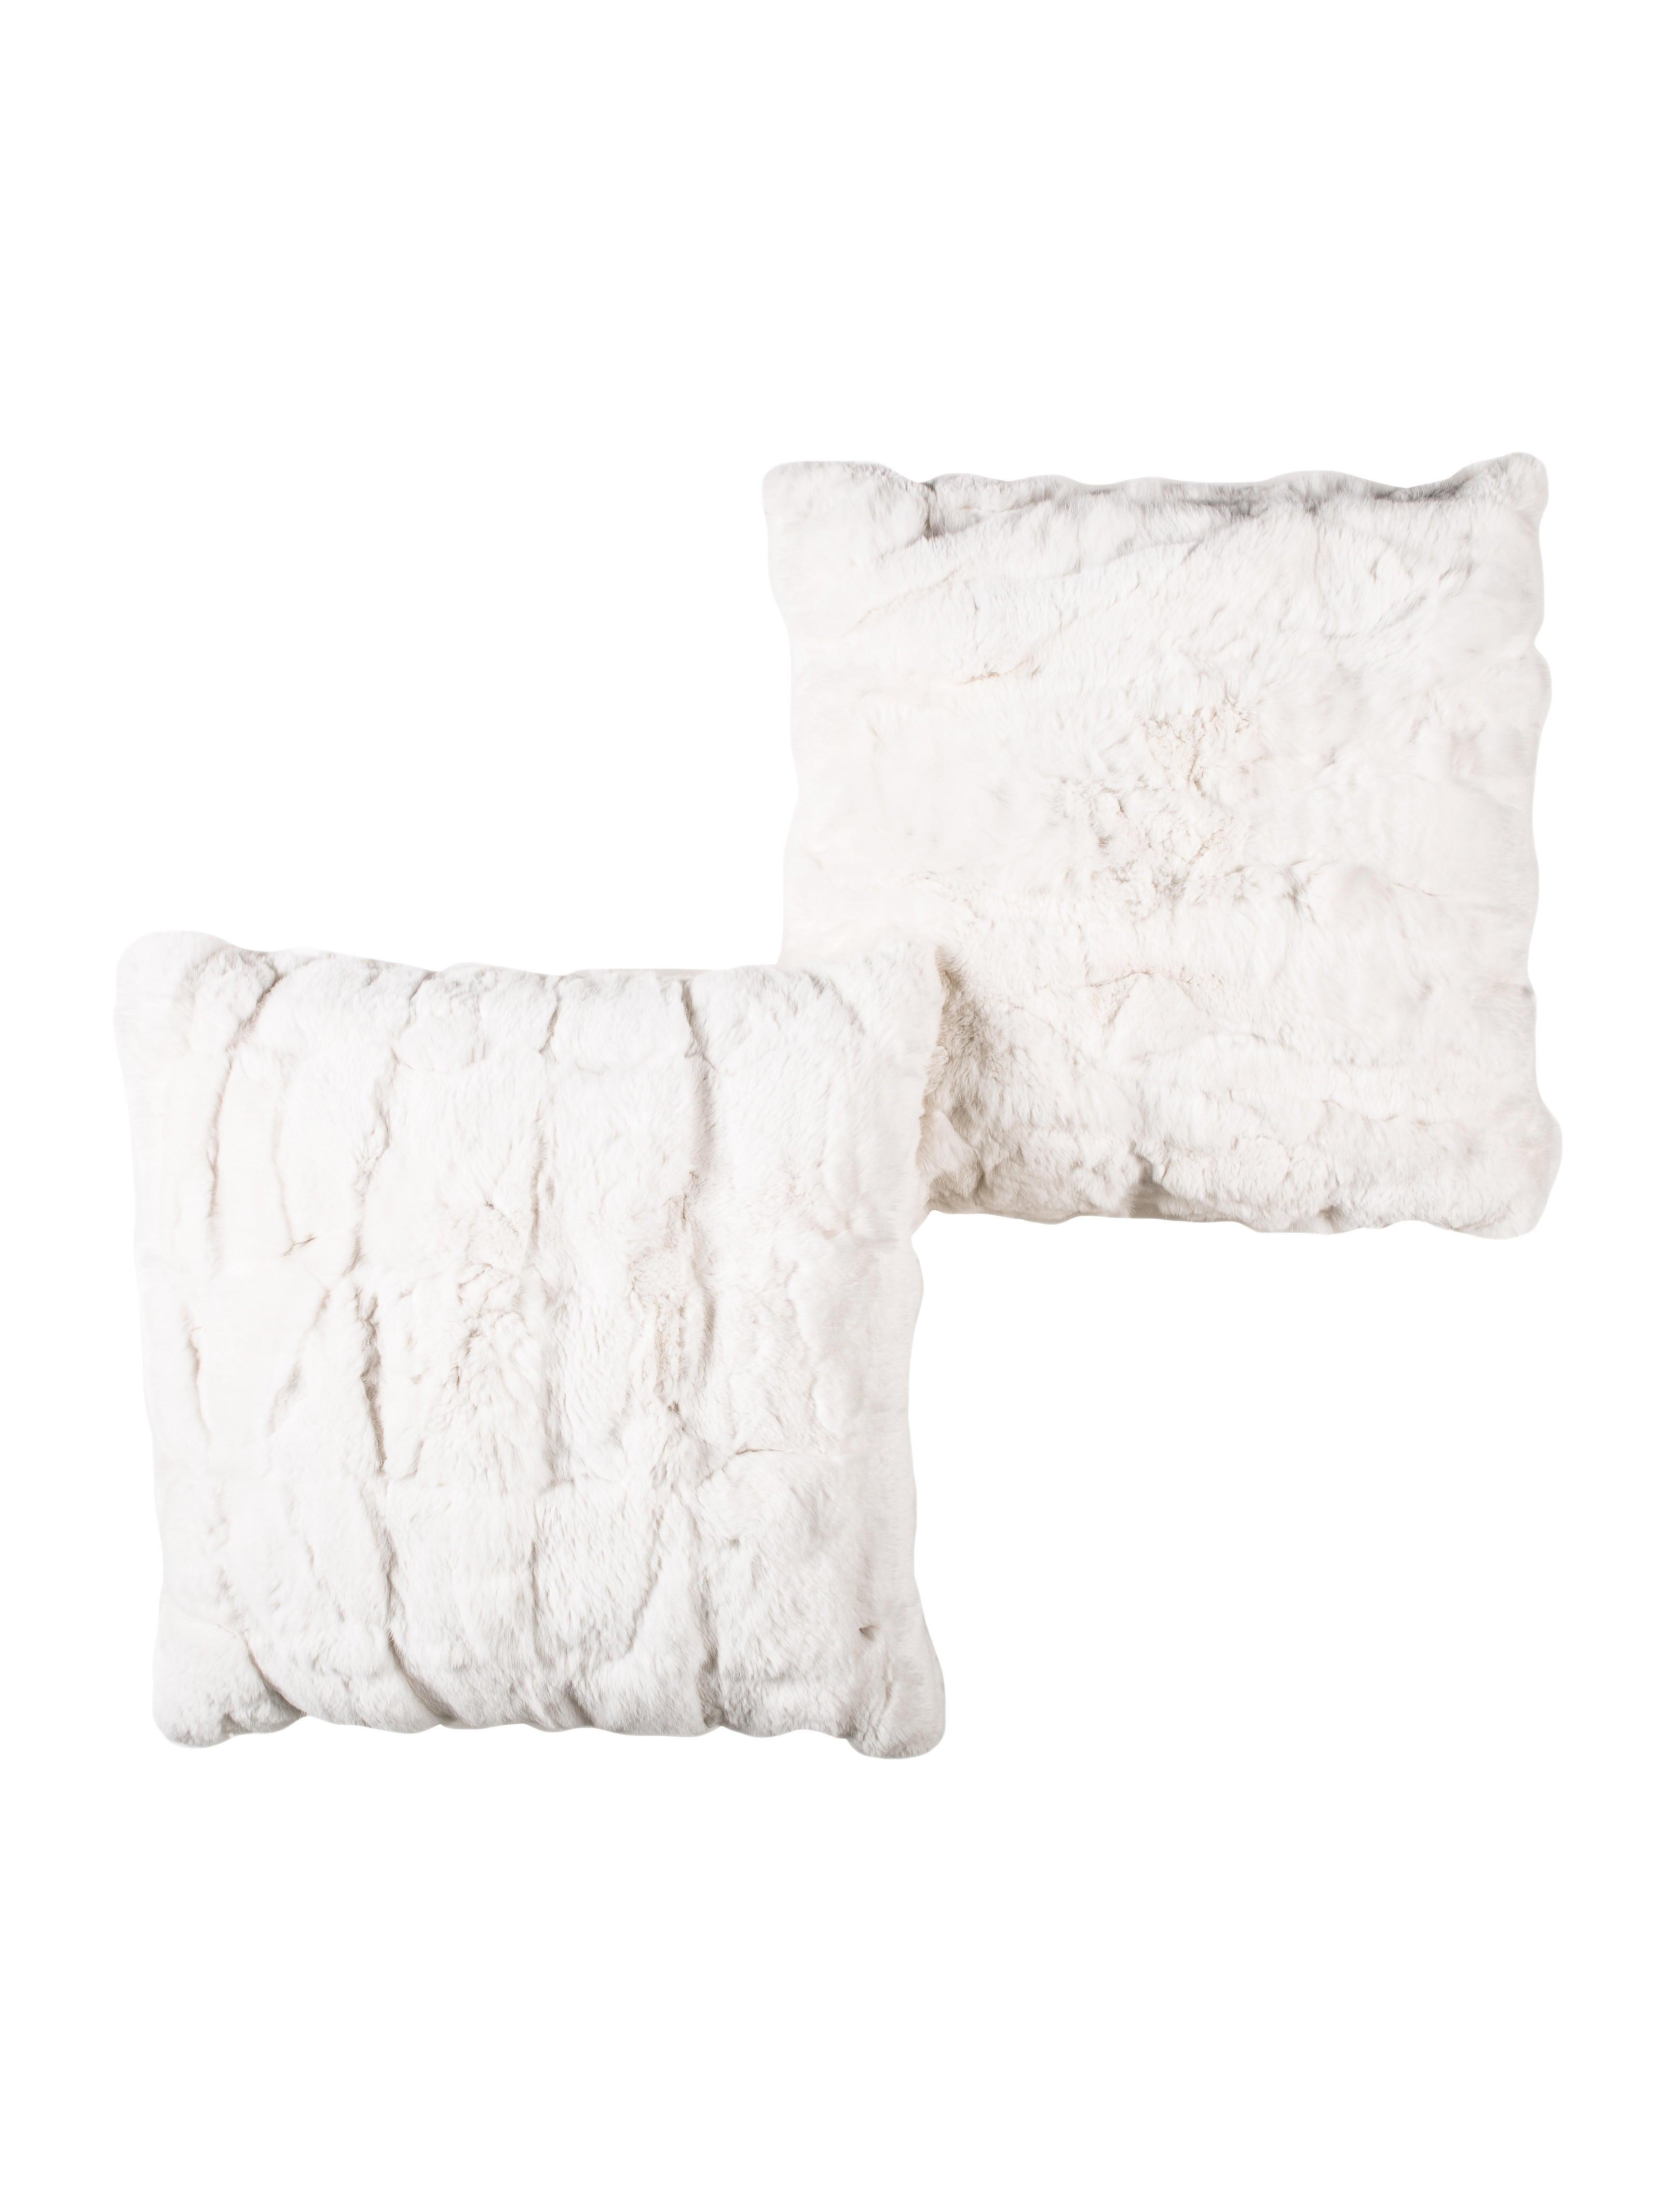 Adrienne Landau Rabbit Fur Pillow Set Pillows Throws Adr21655 The Realreal